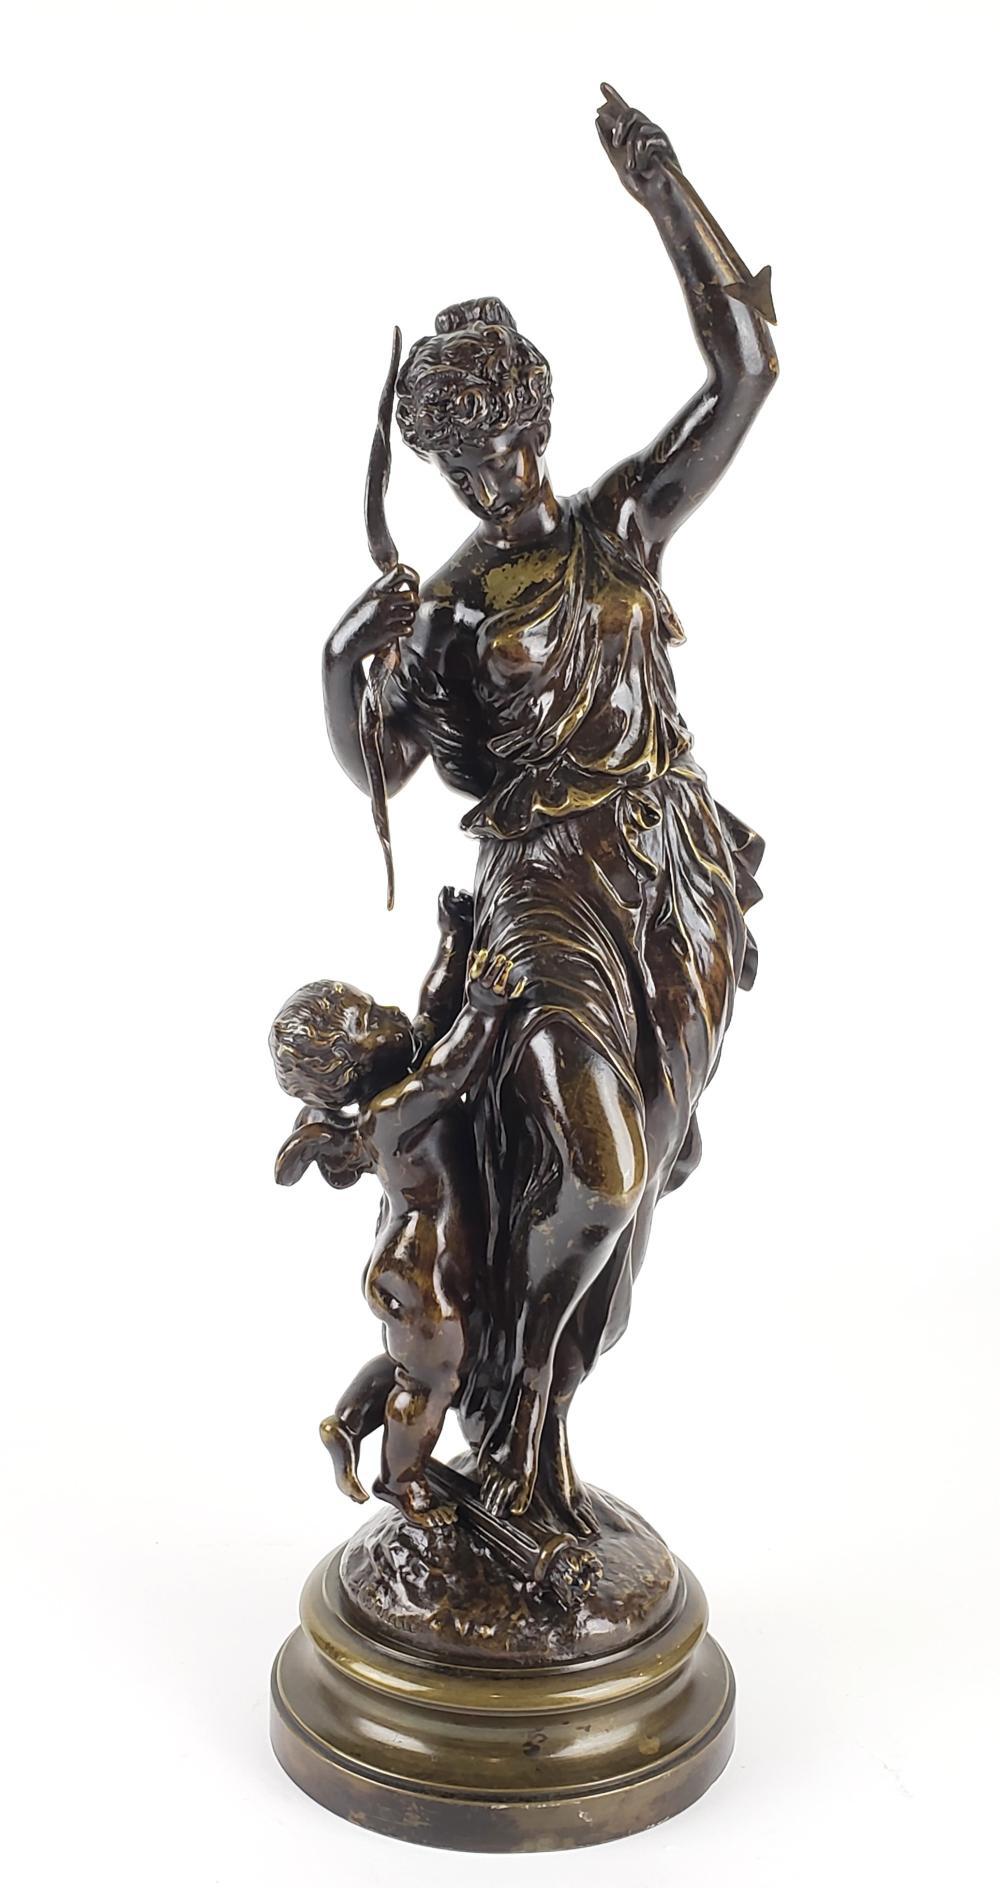 19th C. Bronze Statue of Woman Archer Signed Moreau